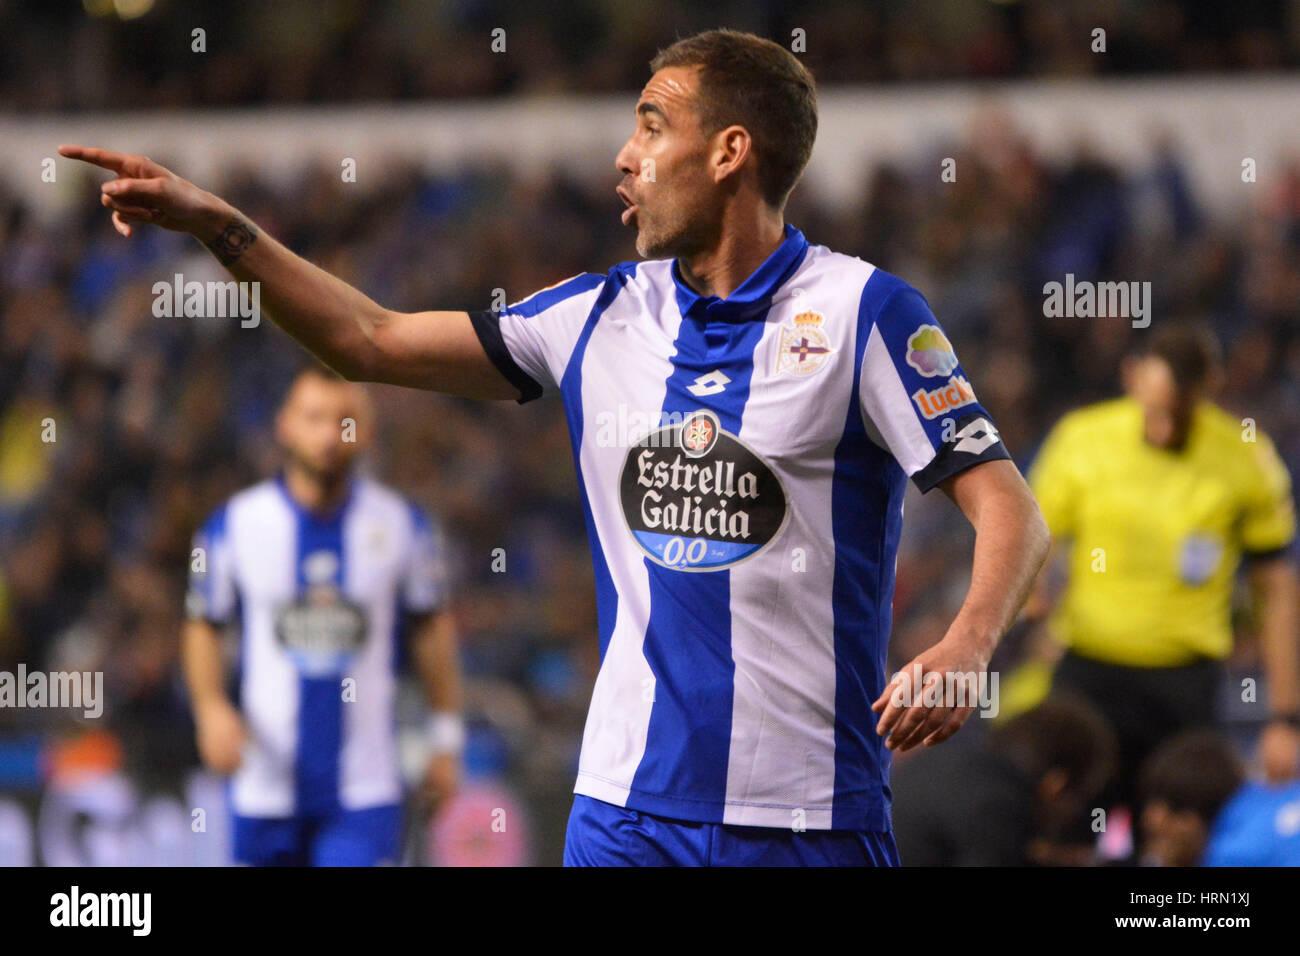 Riazor Stadium, La Coruna, Spain. 2nd March 2017. Navarro. La Liga Santander Matchday 25. Riazor Stadium, La Coruna, - Stock Image